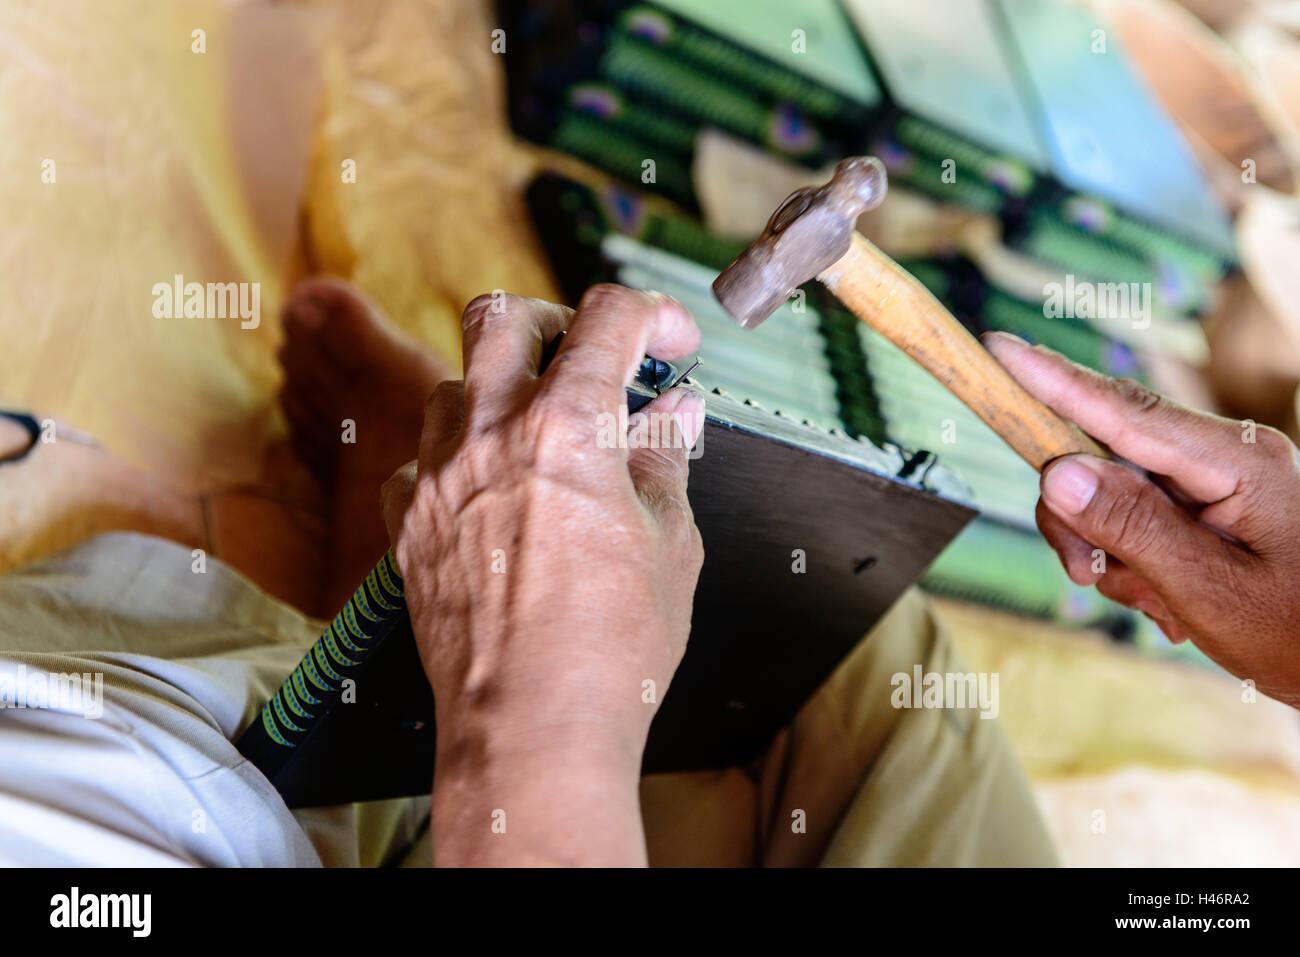 Fair trade handcraft - Stock Image